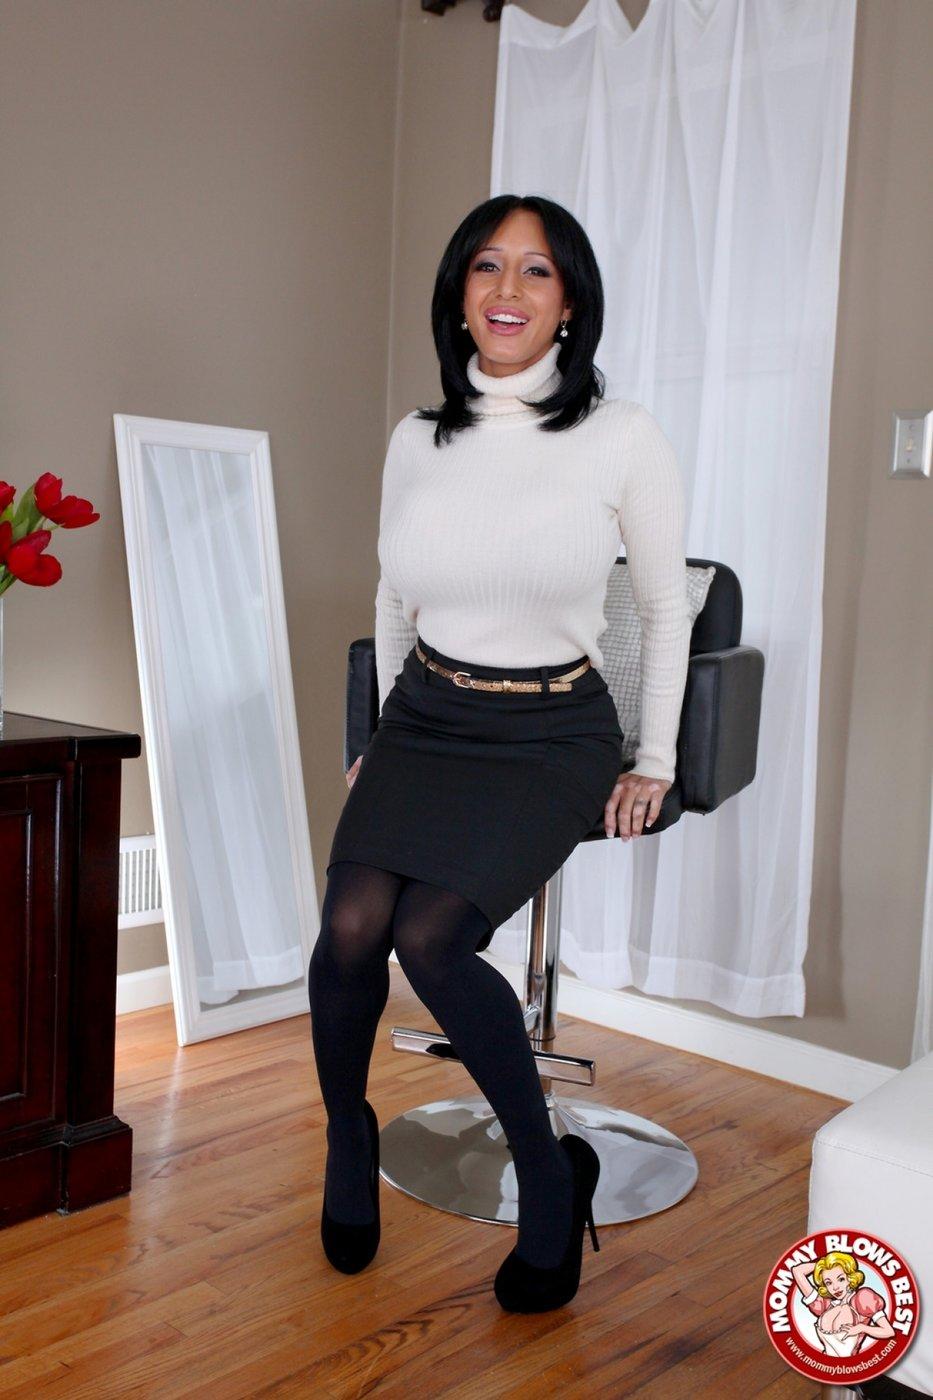 milf tight skirt